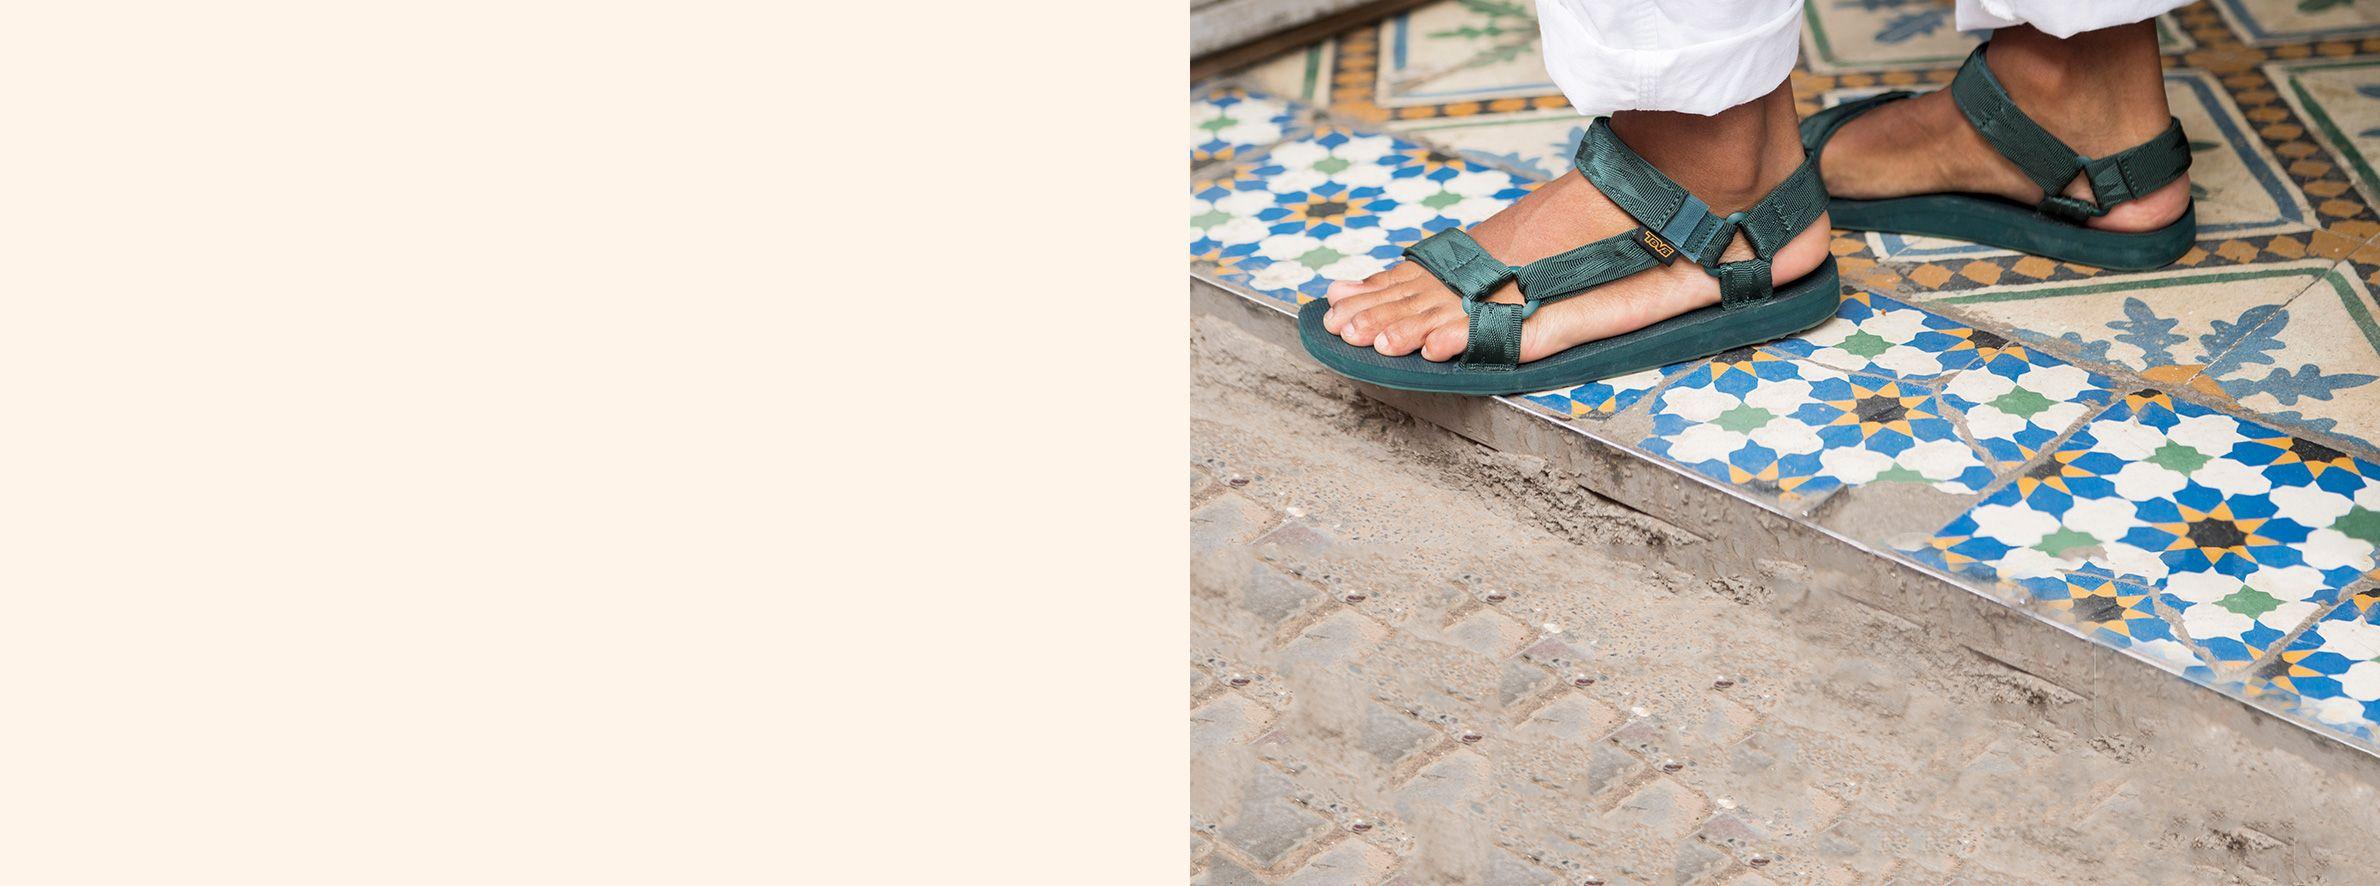 4e5ba21fe709 Shop Teva Sandals